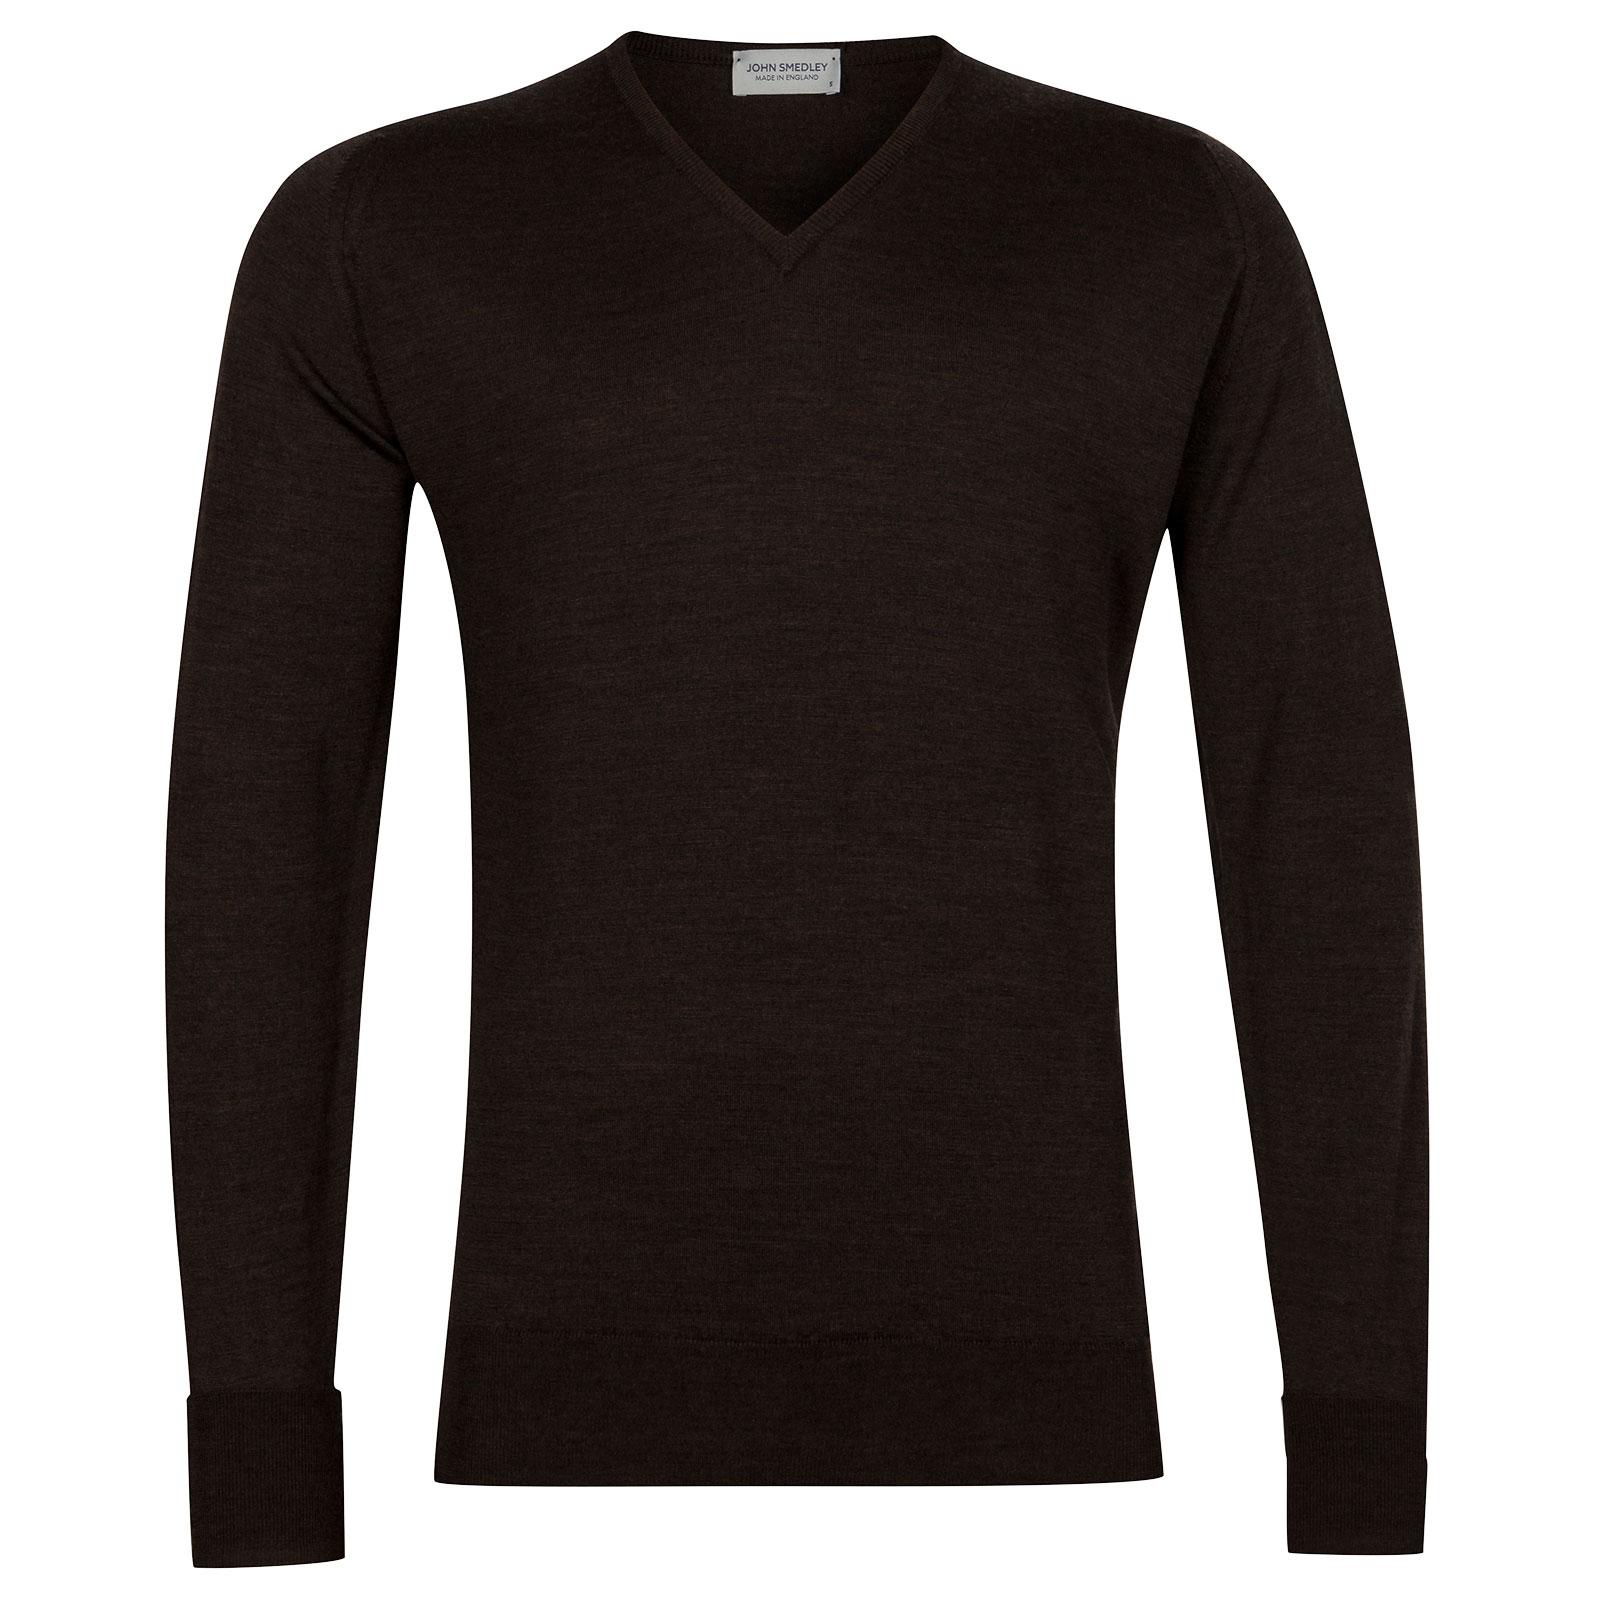 John Smedley Bobby Merino Wool Pullover in Chestnut-XL